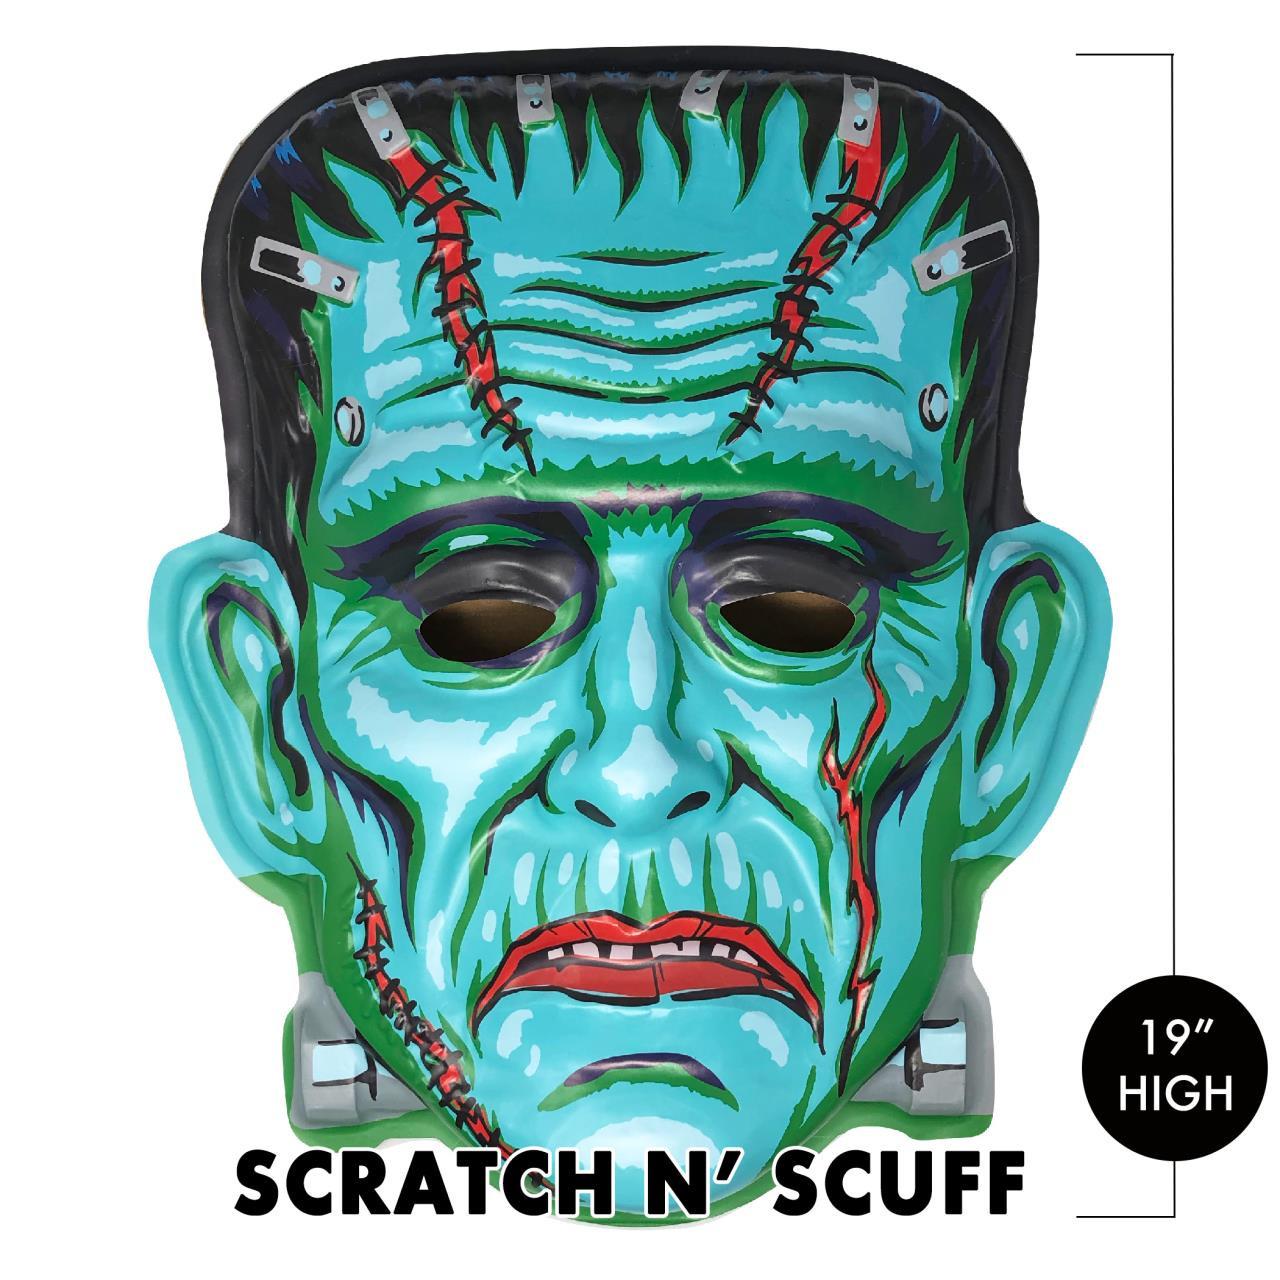 Scratch n' Scuff Code Blue Frankie 3-D Wall Decor* -